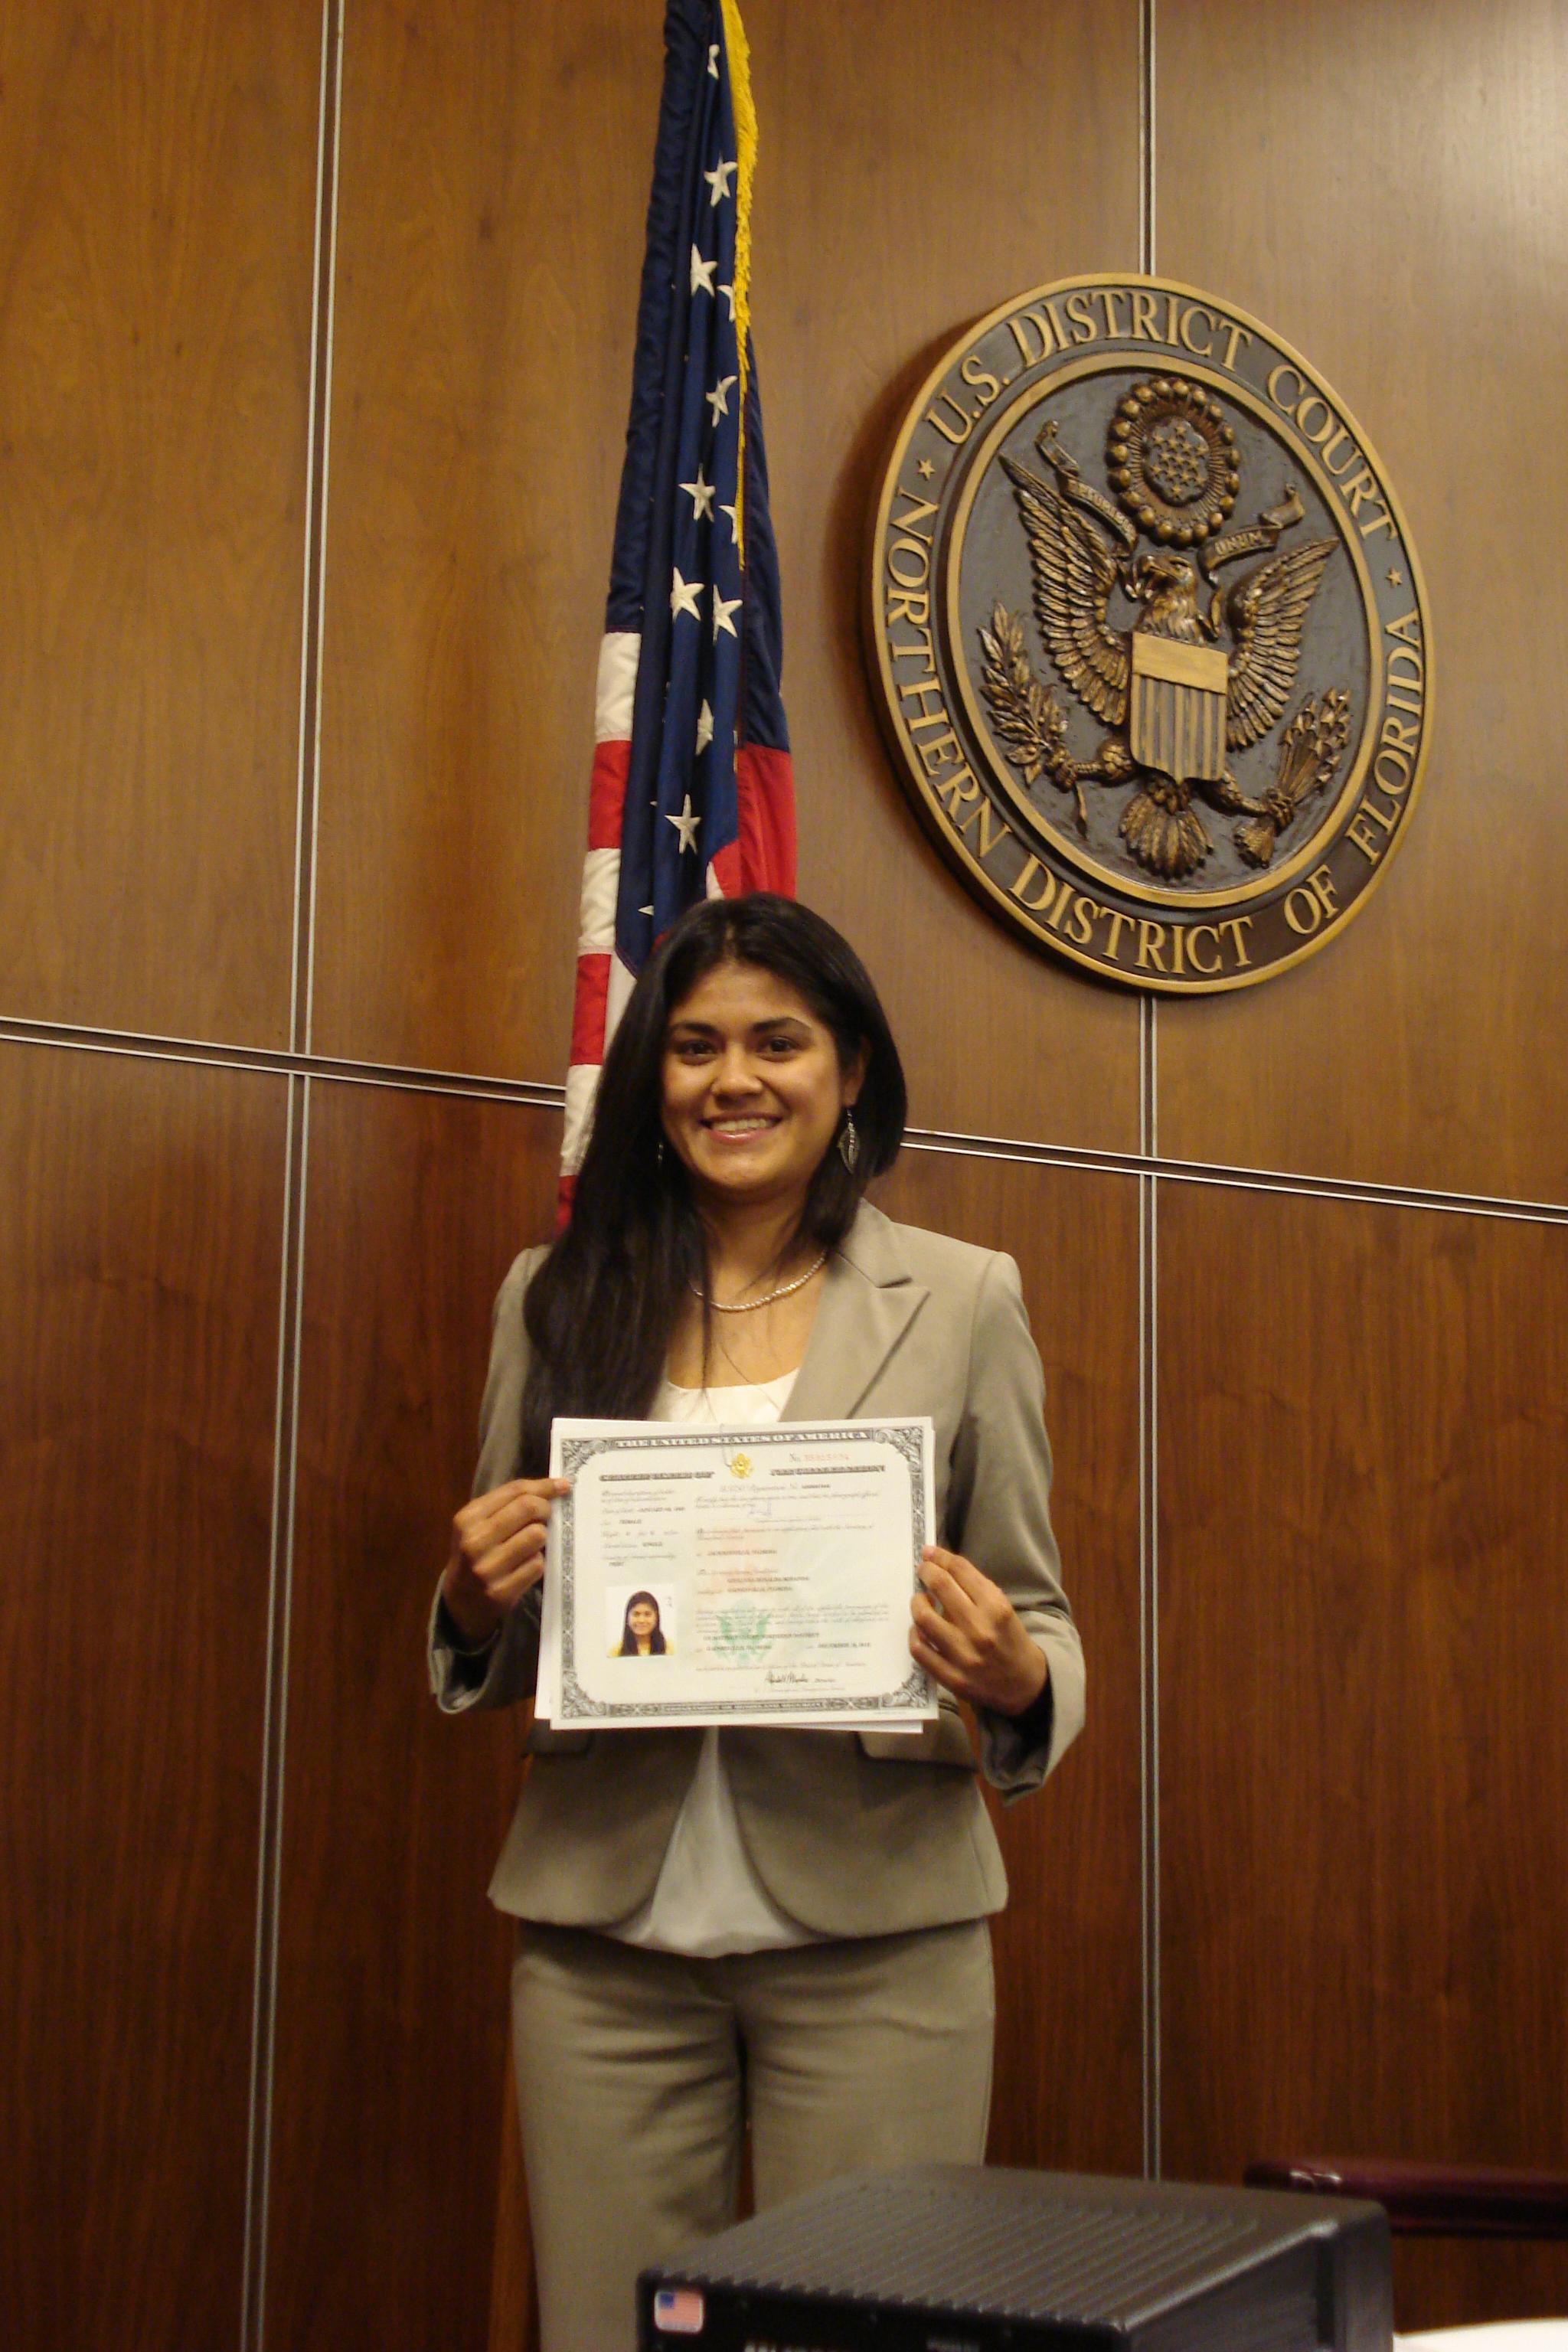 Sophomore Veterinary Student Celebrates Us Citizenship The